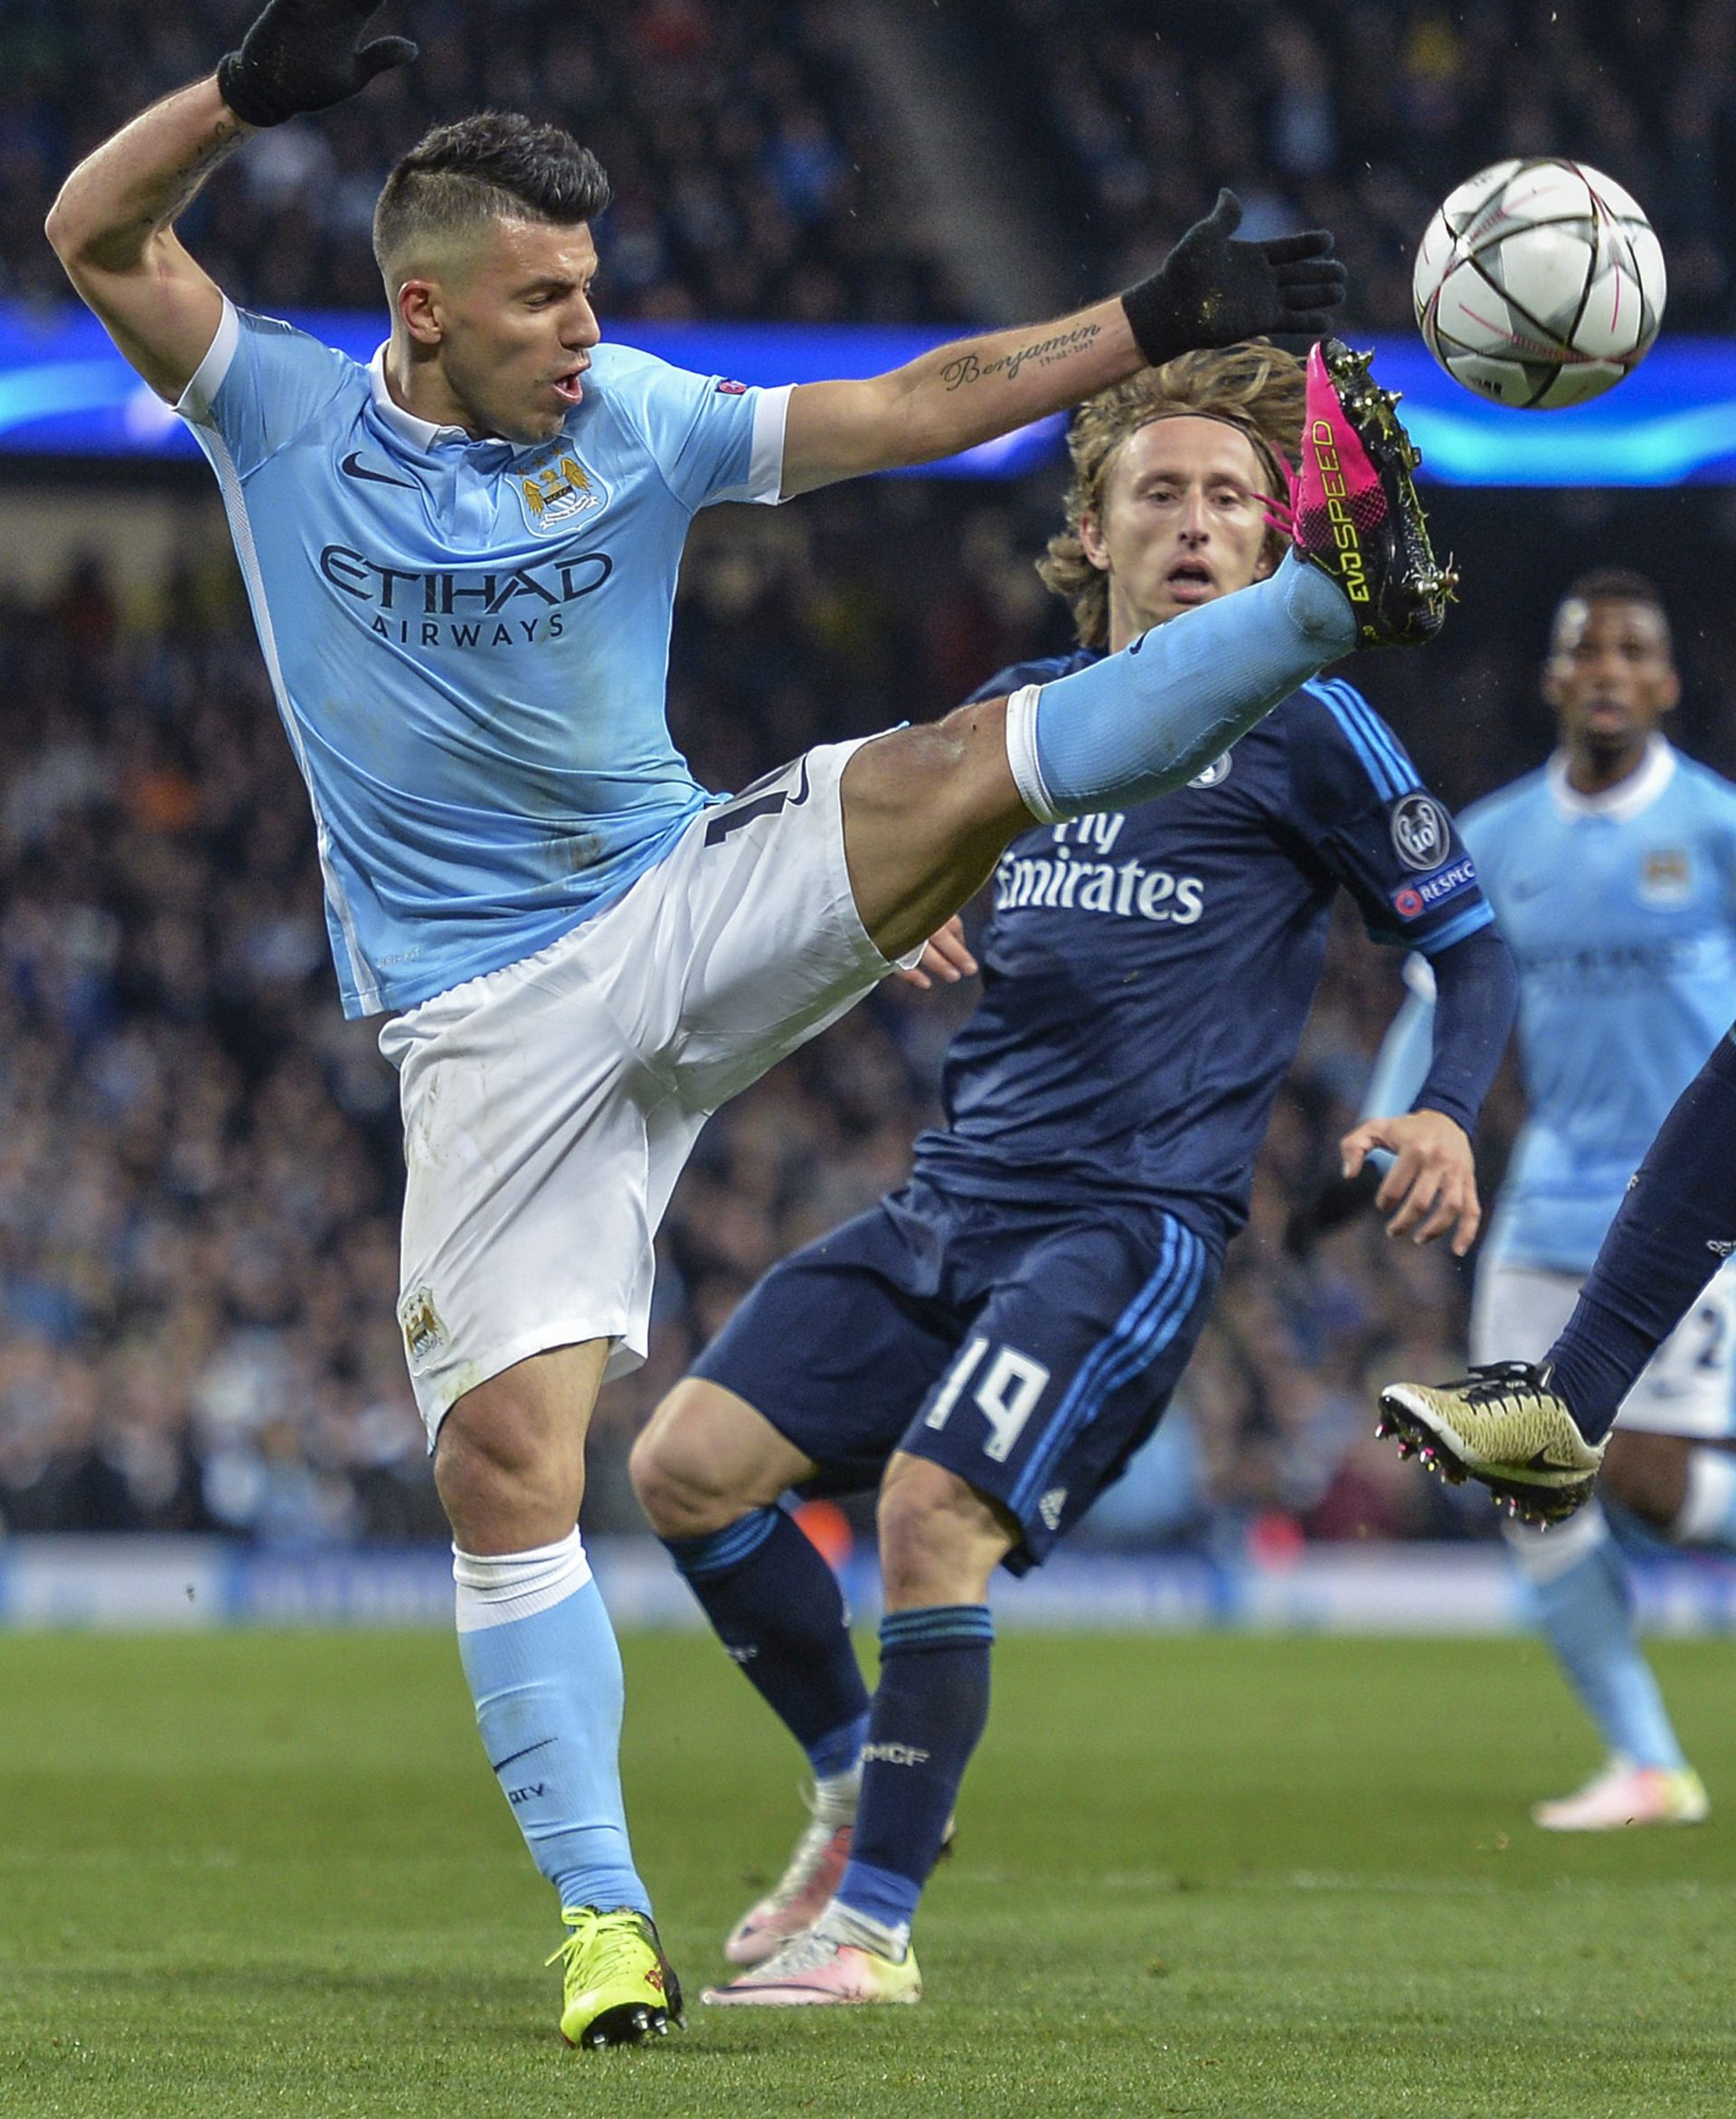 LIGA PRVAKA: Manchester City – Real Madrid 0-0